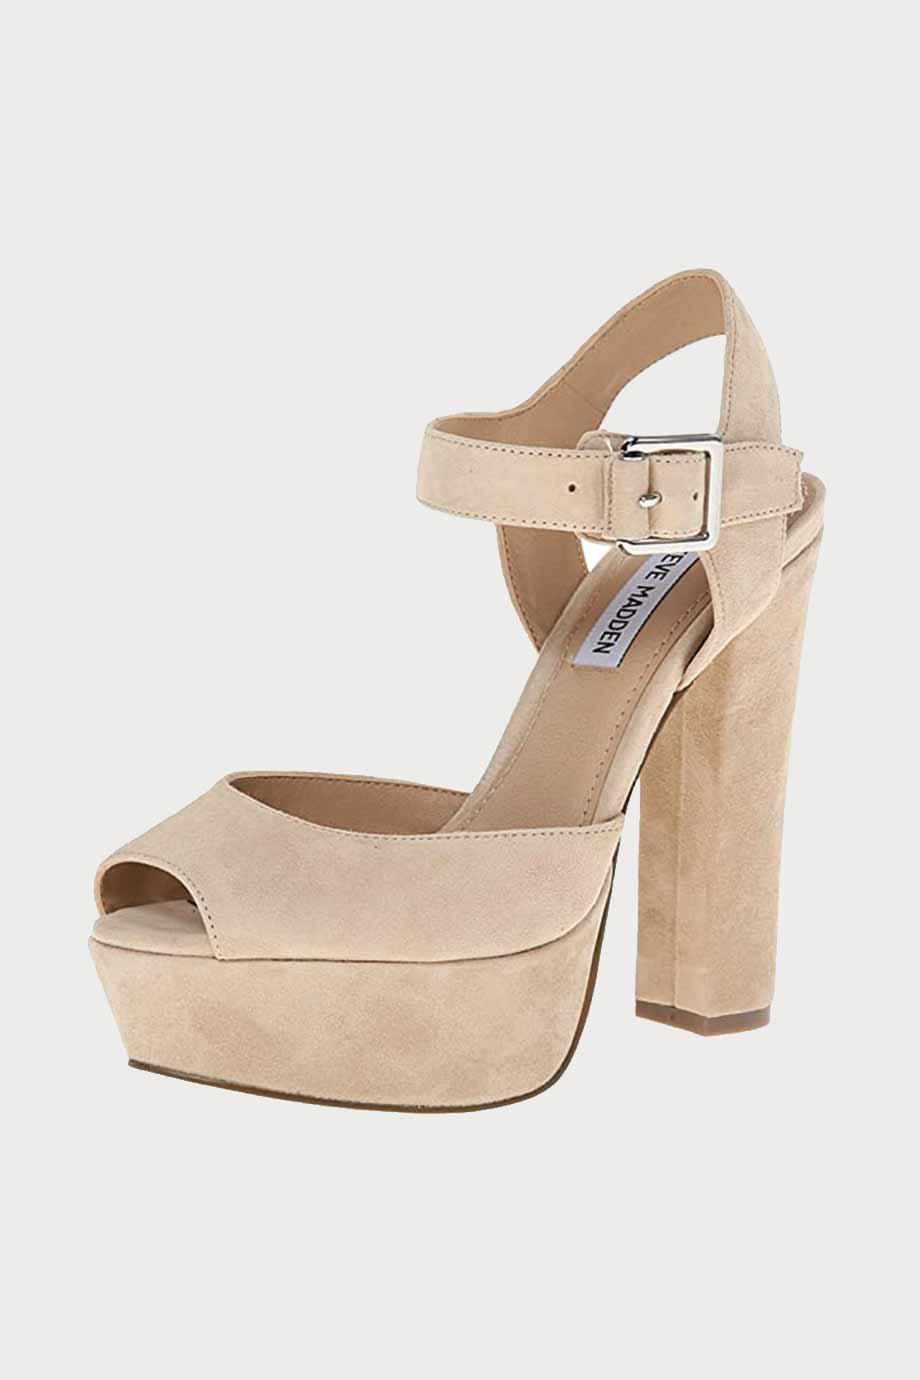 spiridoula metheniti shoes xalkida p Steve Madden 115744 Jillyy clarks blush suede 2